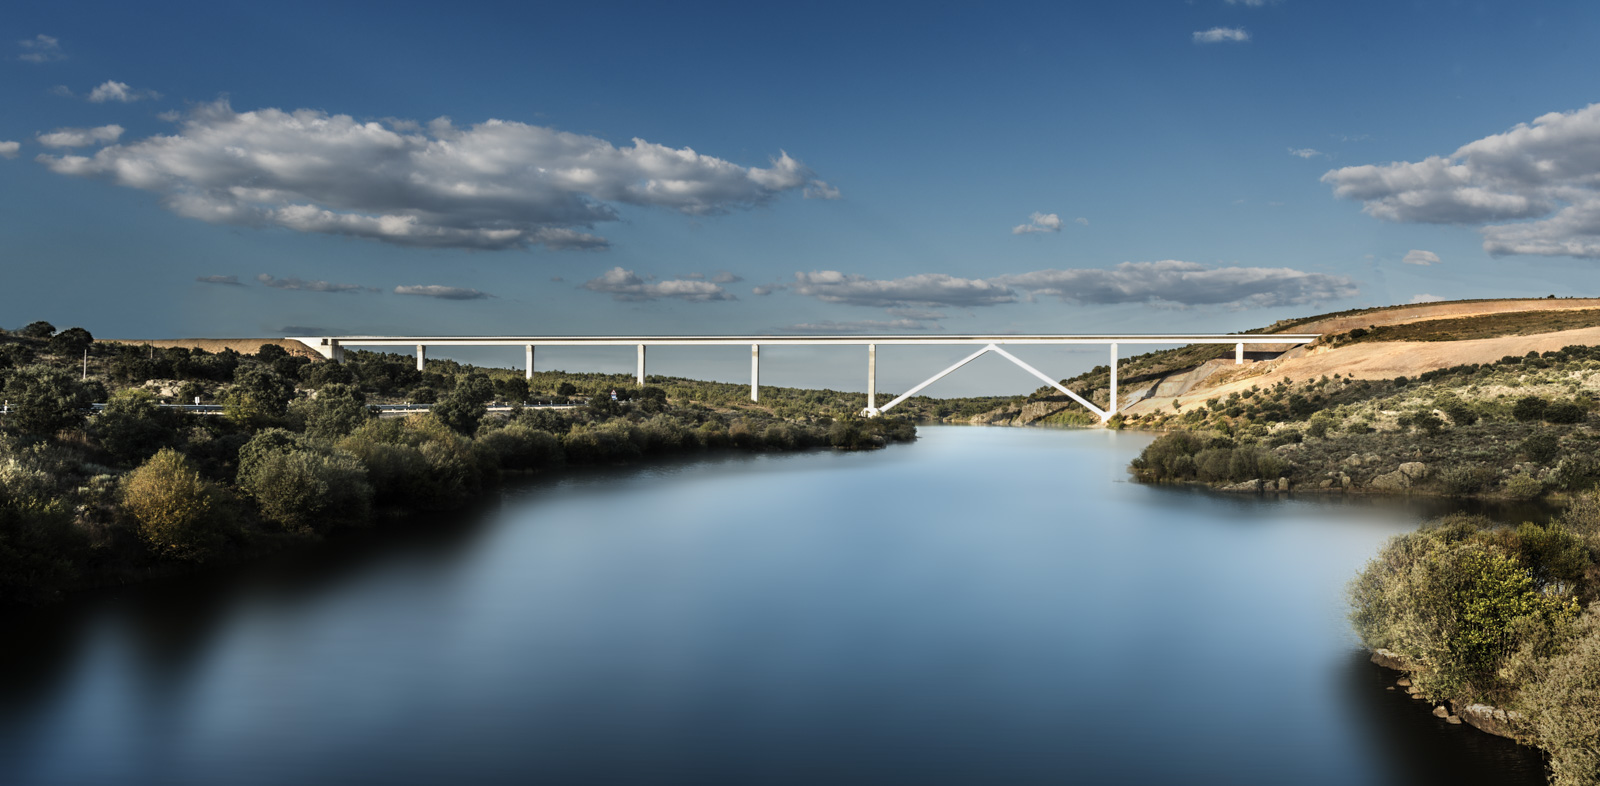 20141001-183850-CFCSL_Viaducto_del_Tera_Zamora-Editar-Editar-Editar